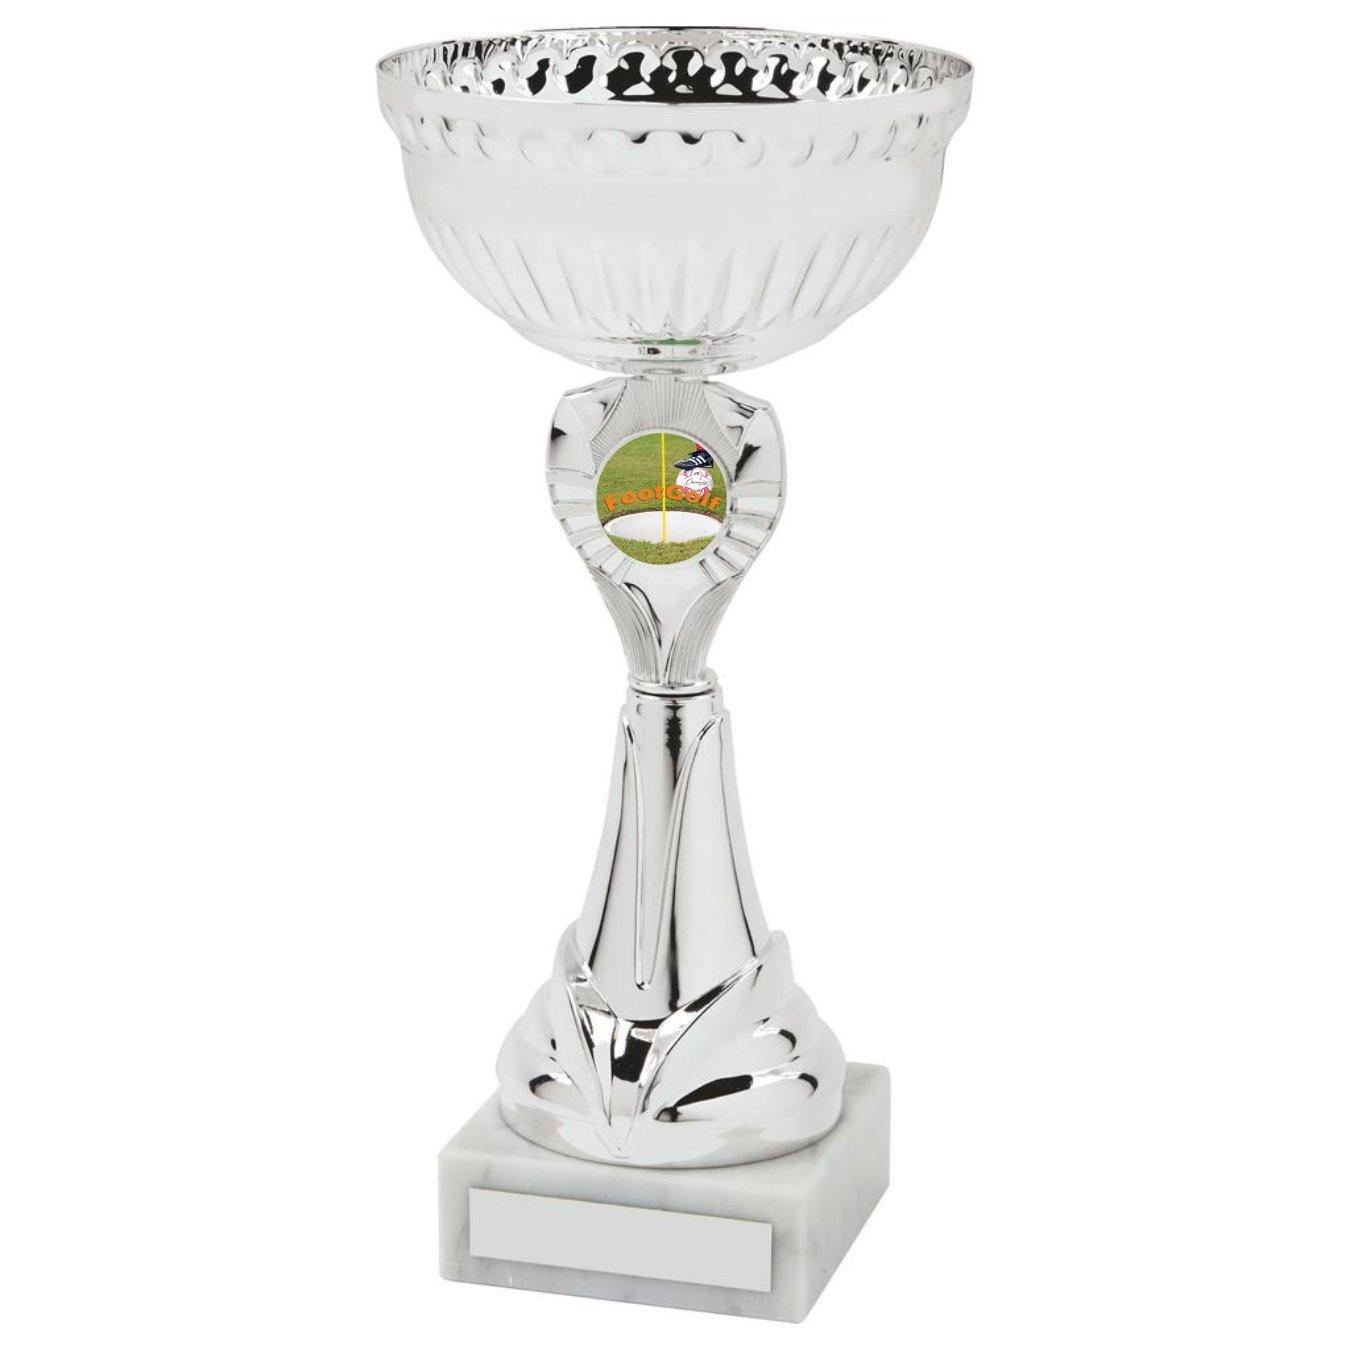 FootGolf Chrome Coloured Cup